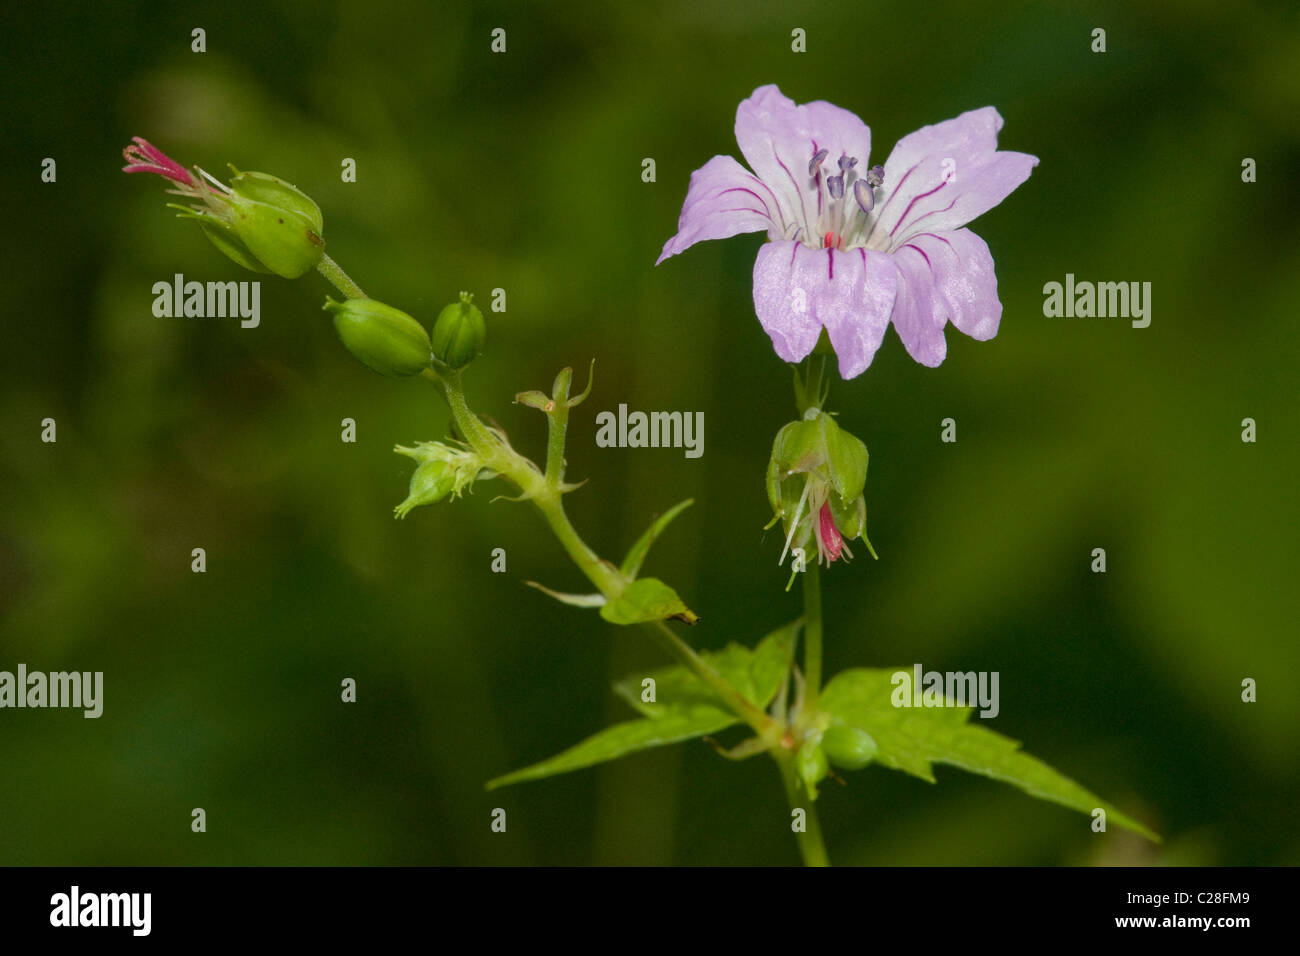 Knotted Cranesbill (Geranium nodosum), flowering stalk. Stock Photo